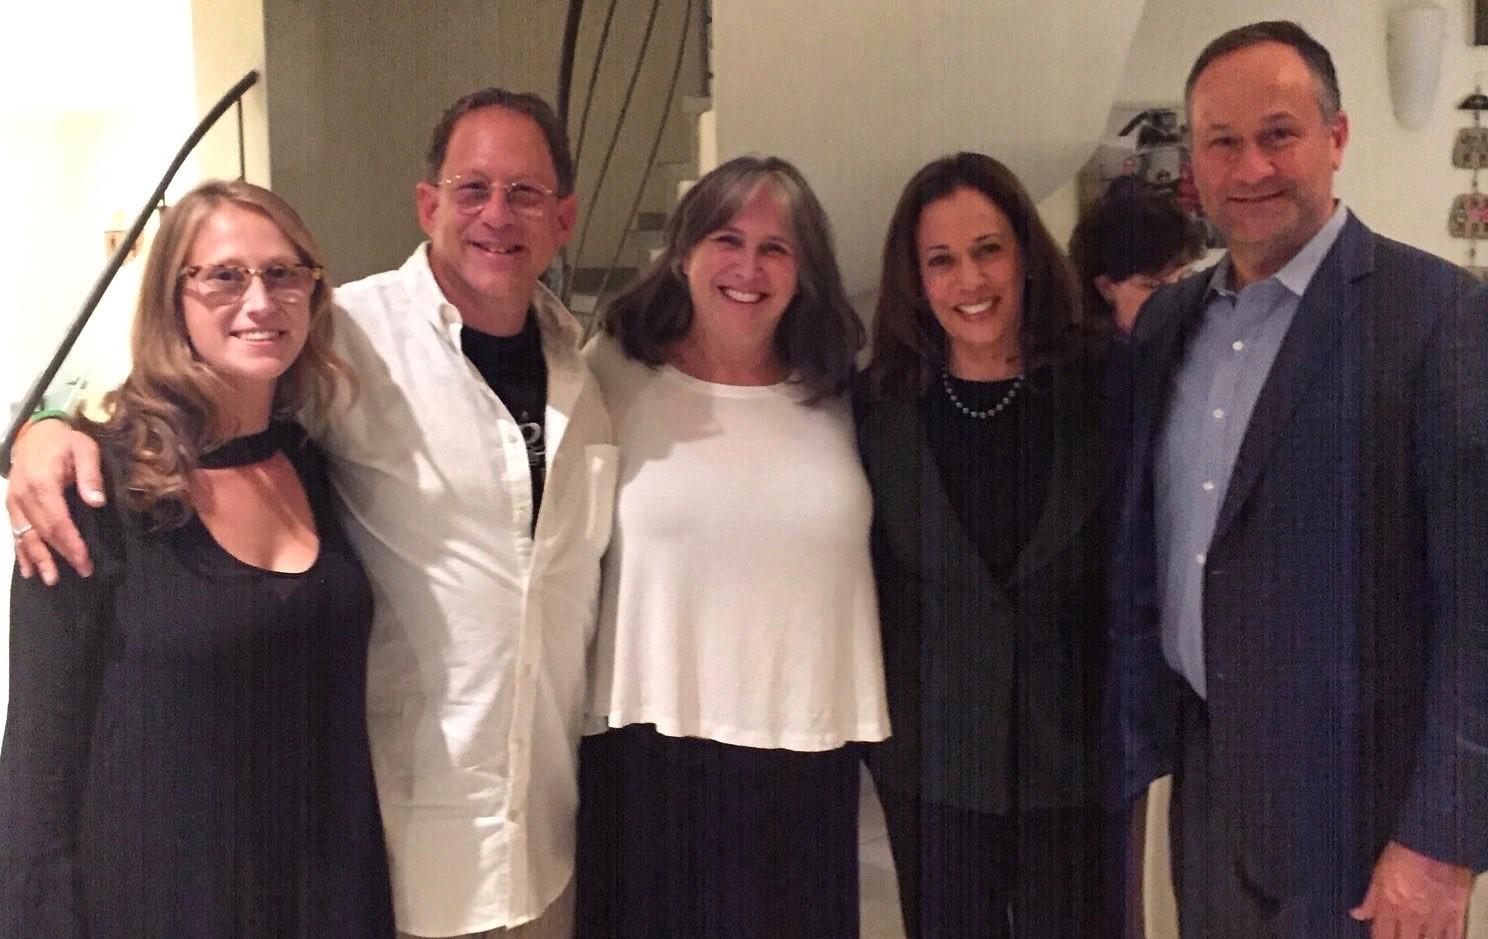 Shabbat dinner with Kamala and Doug